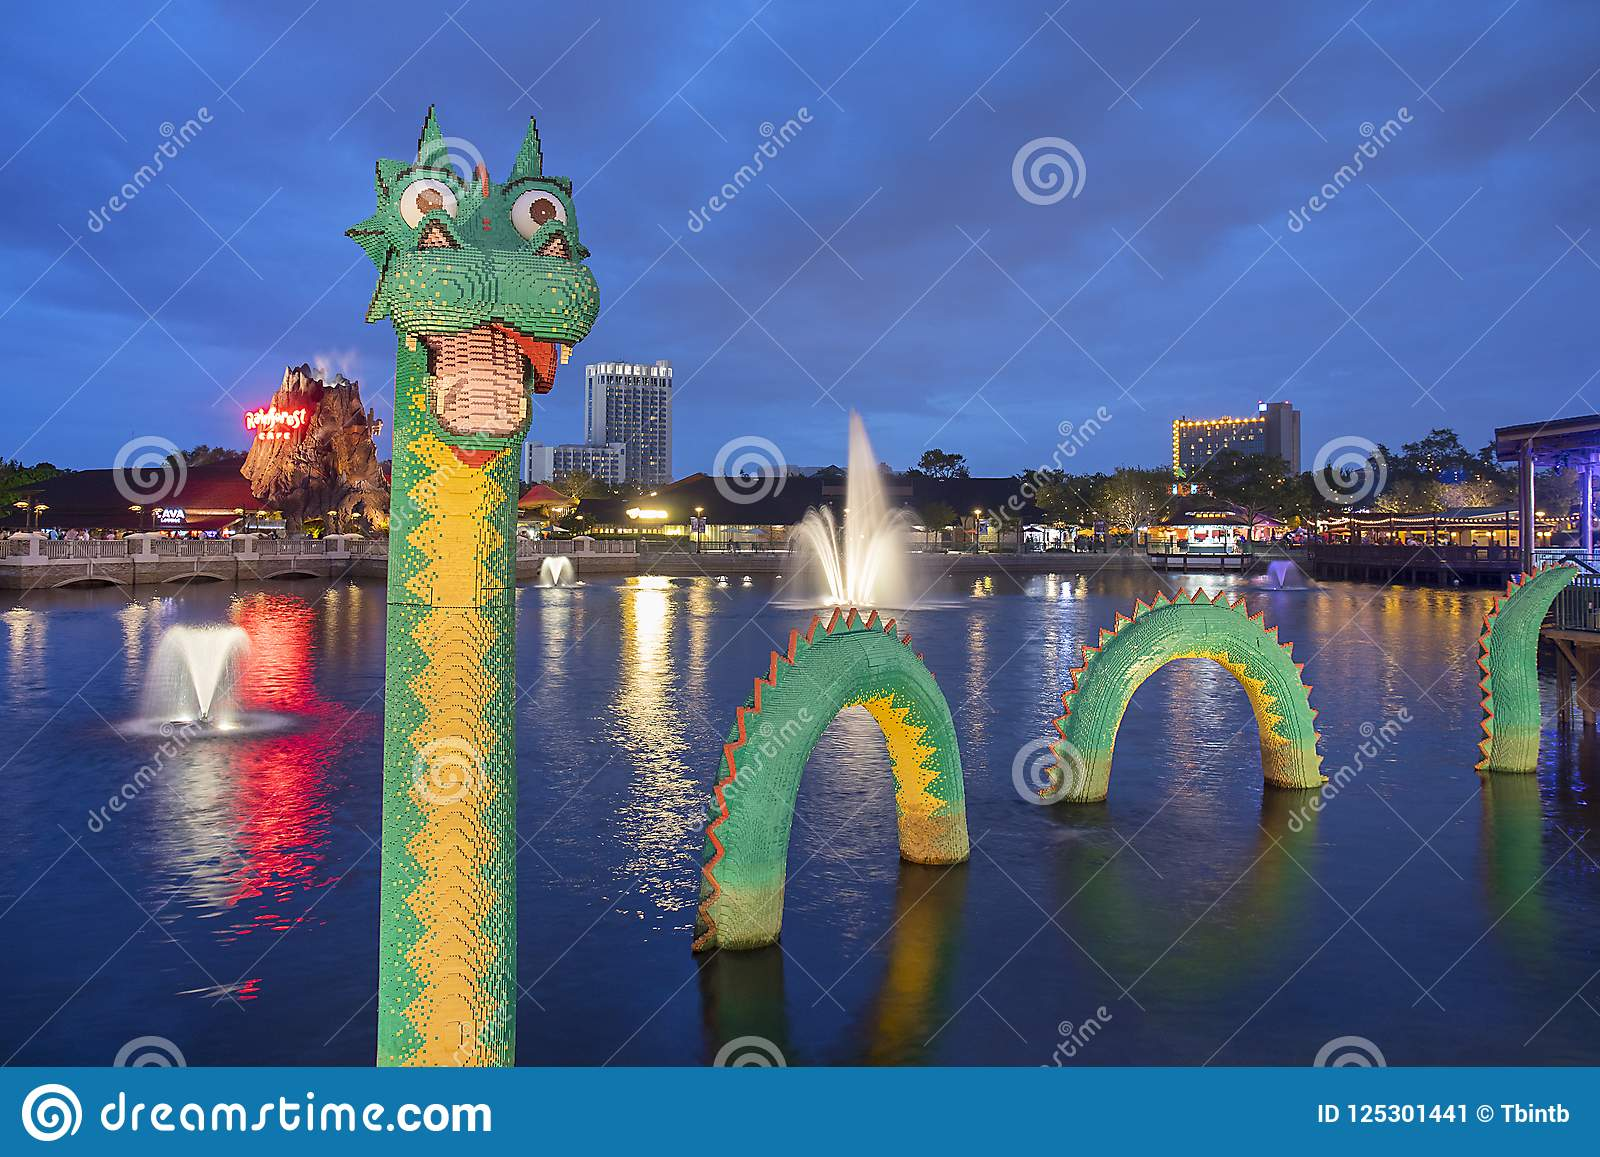 Brickley Lego Water Dragon At Disney springt bij Nacht op